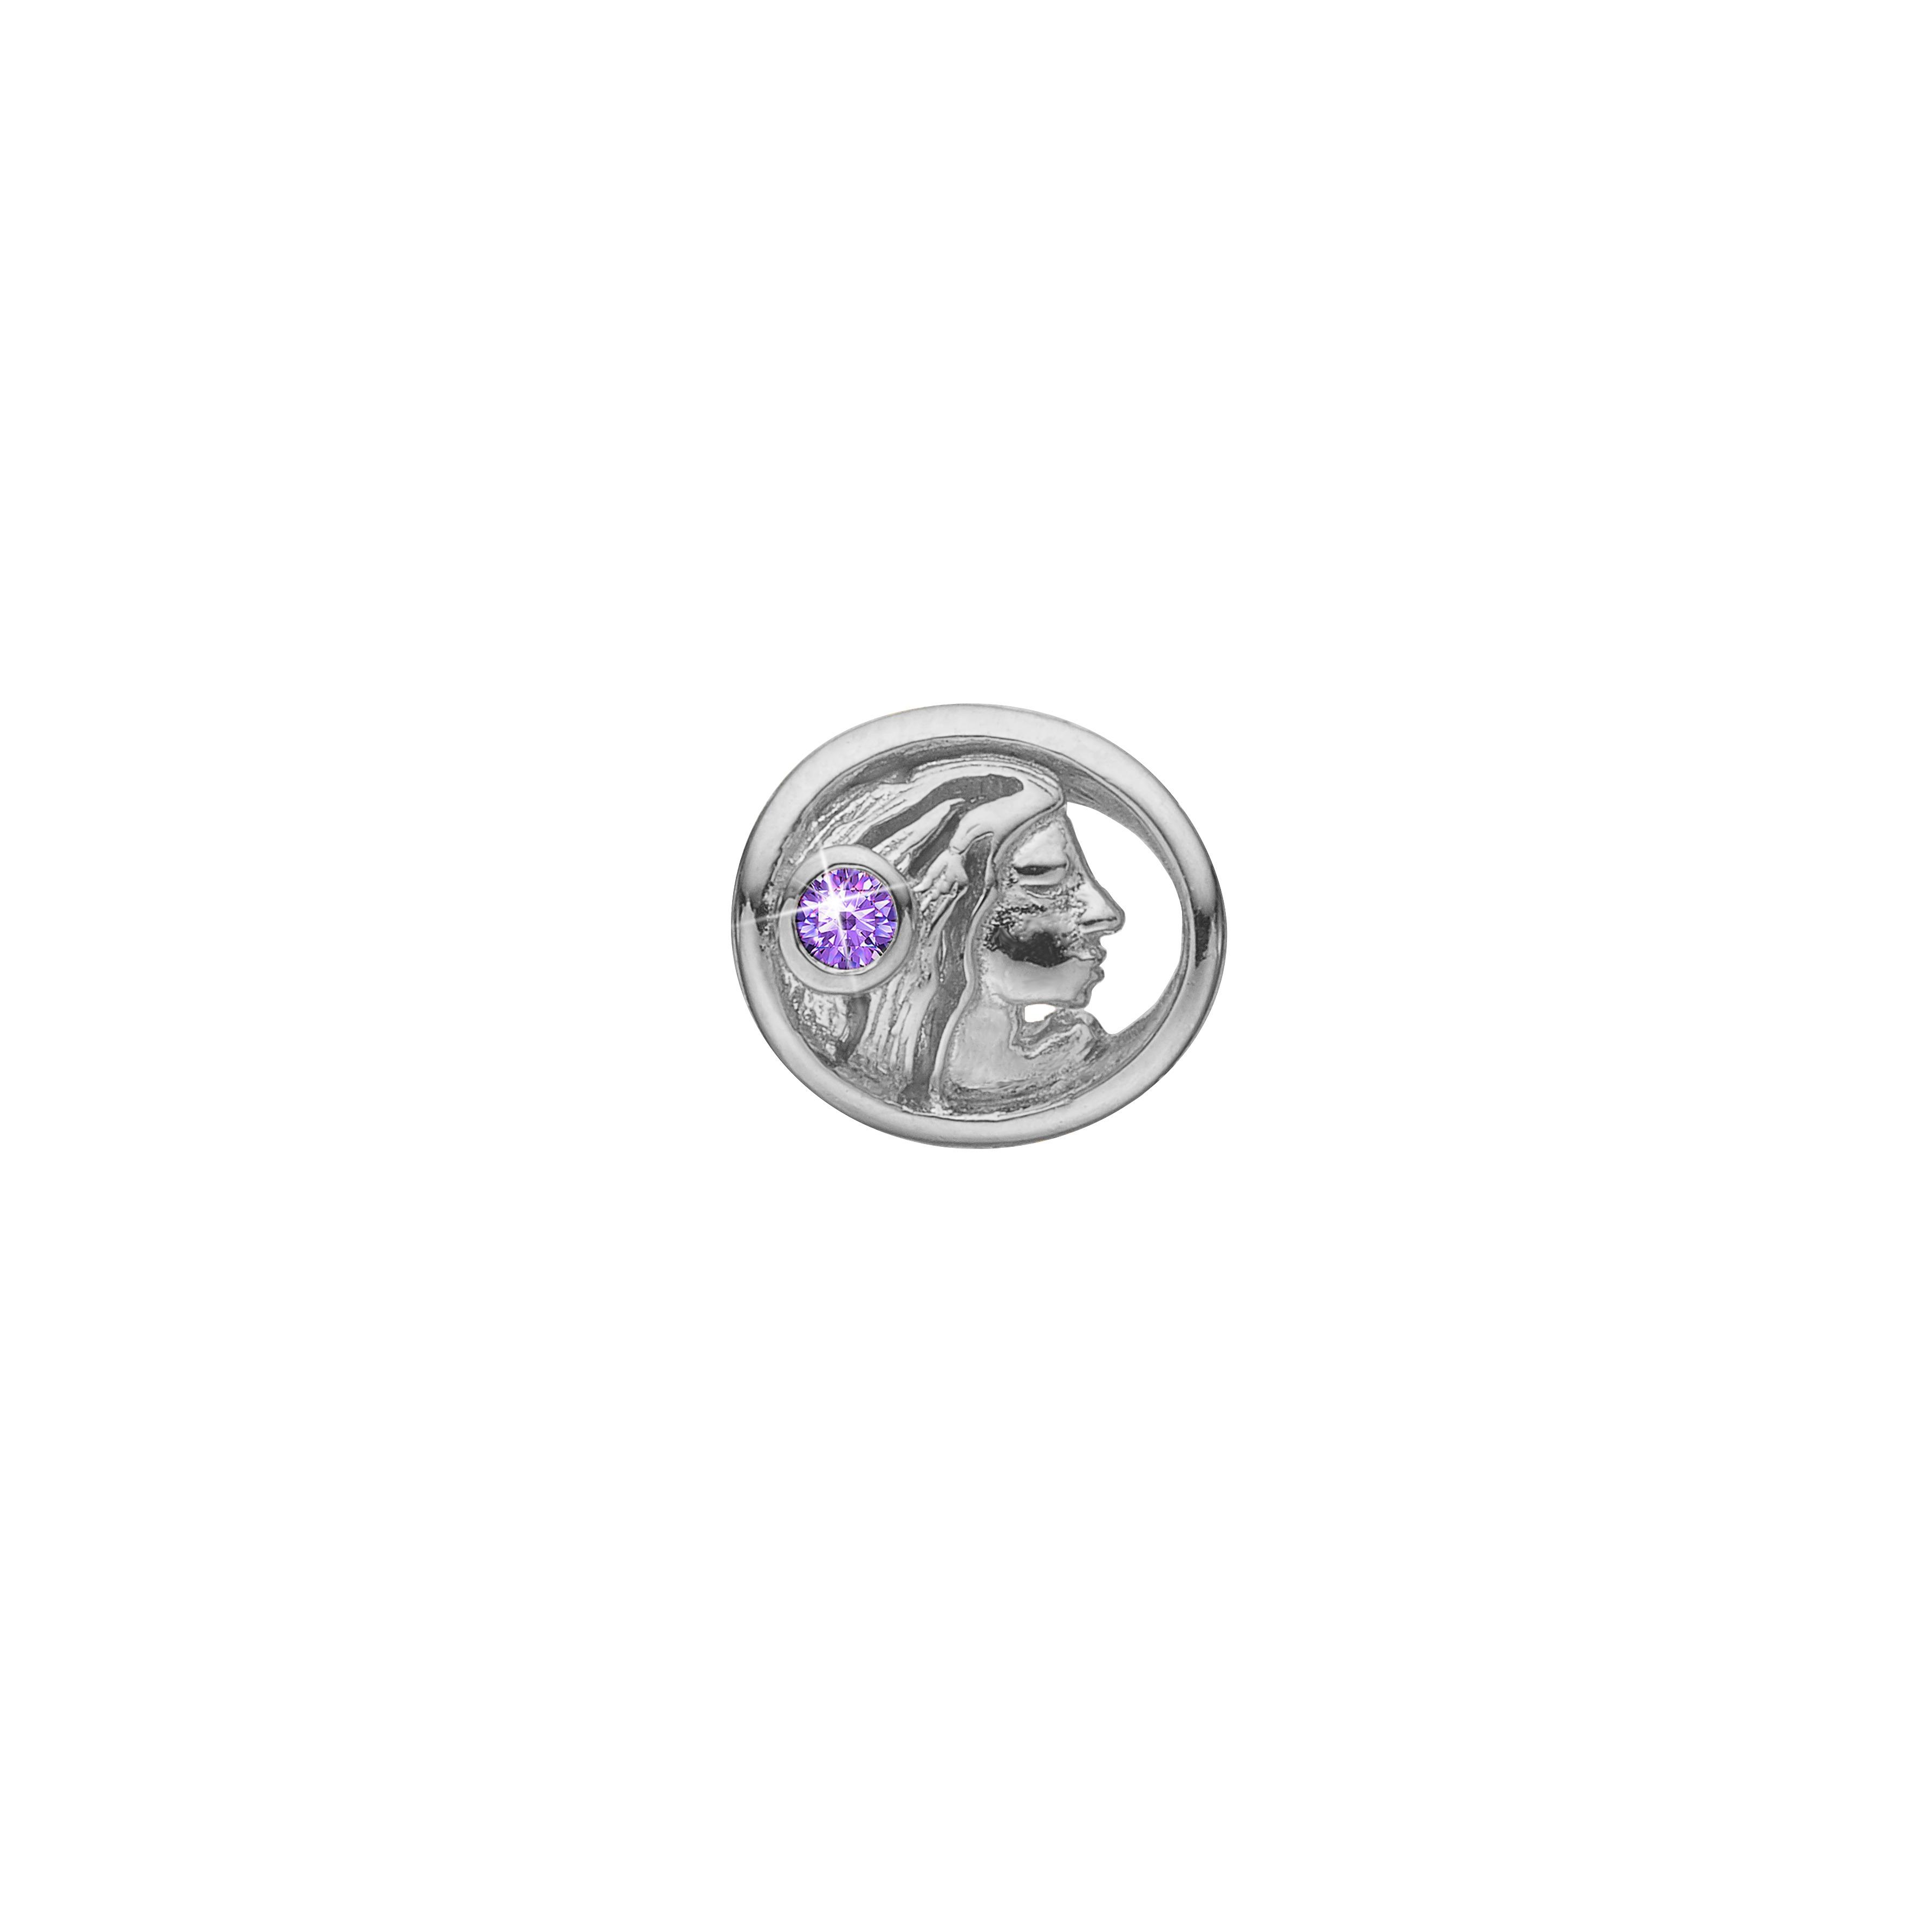 CHRISTINA Charm jomfru - 630-S67-8